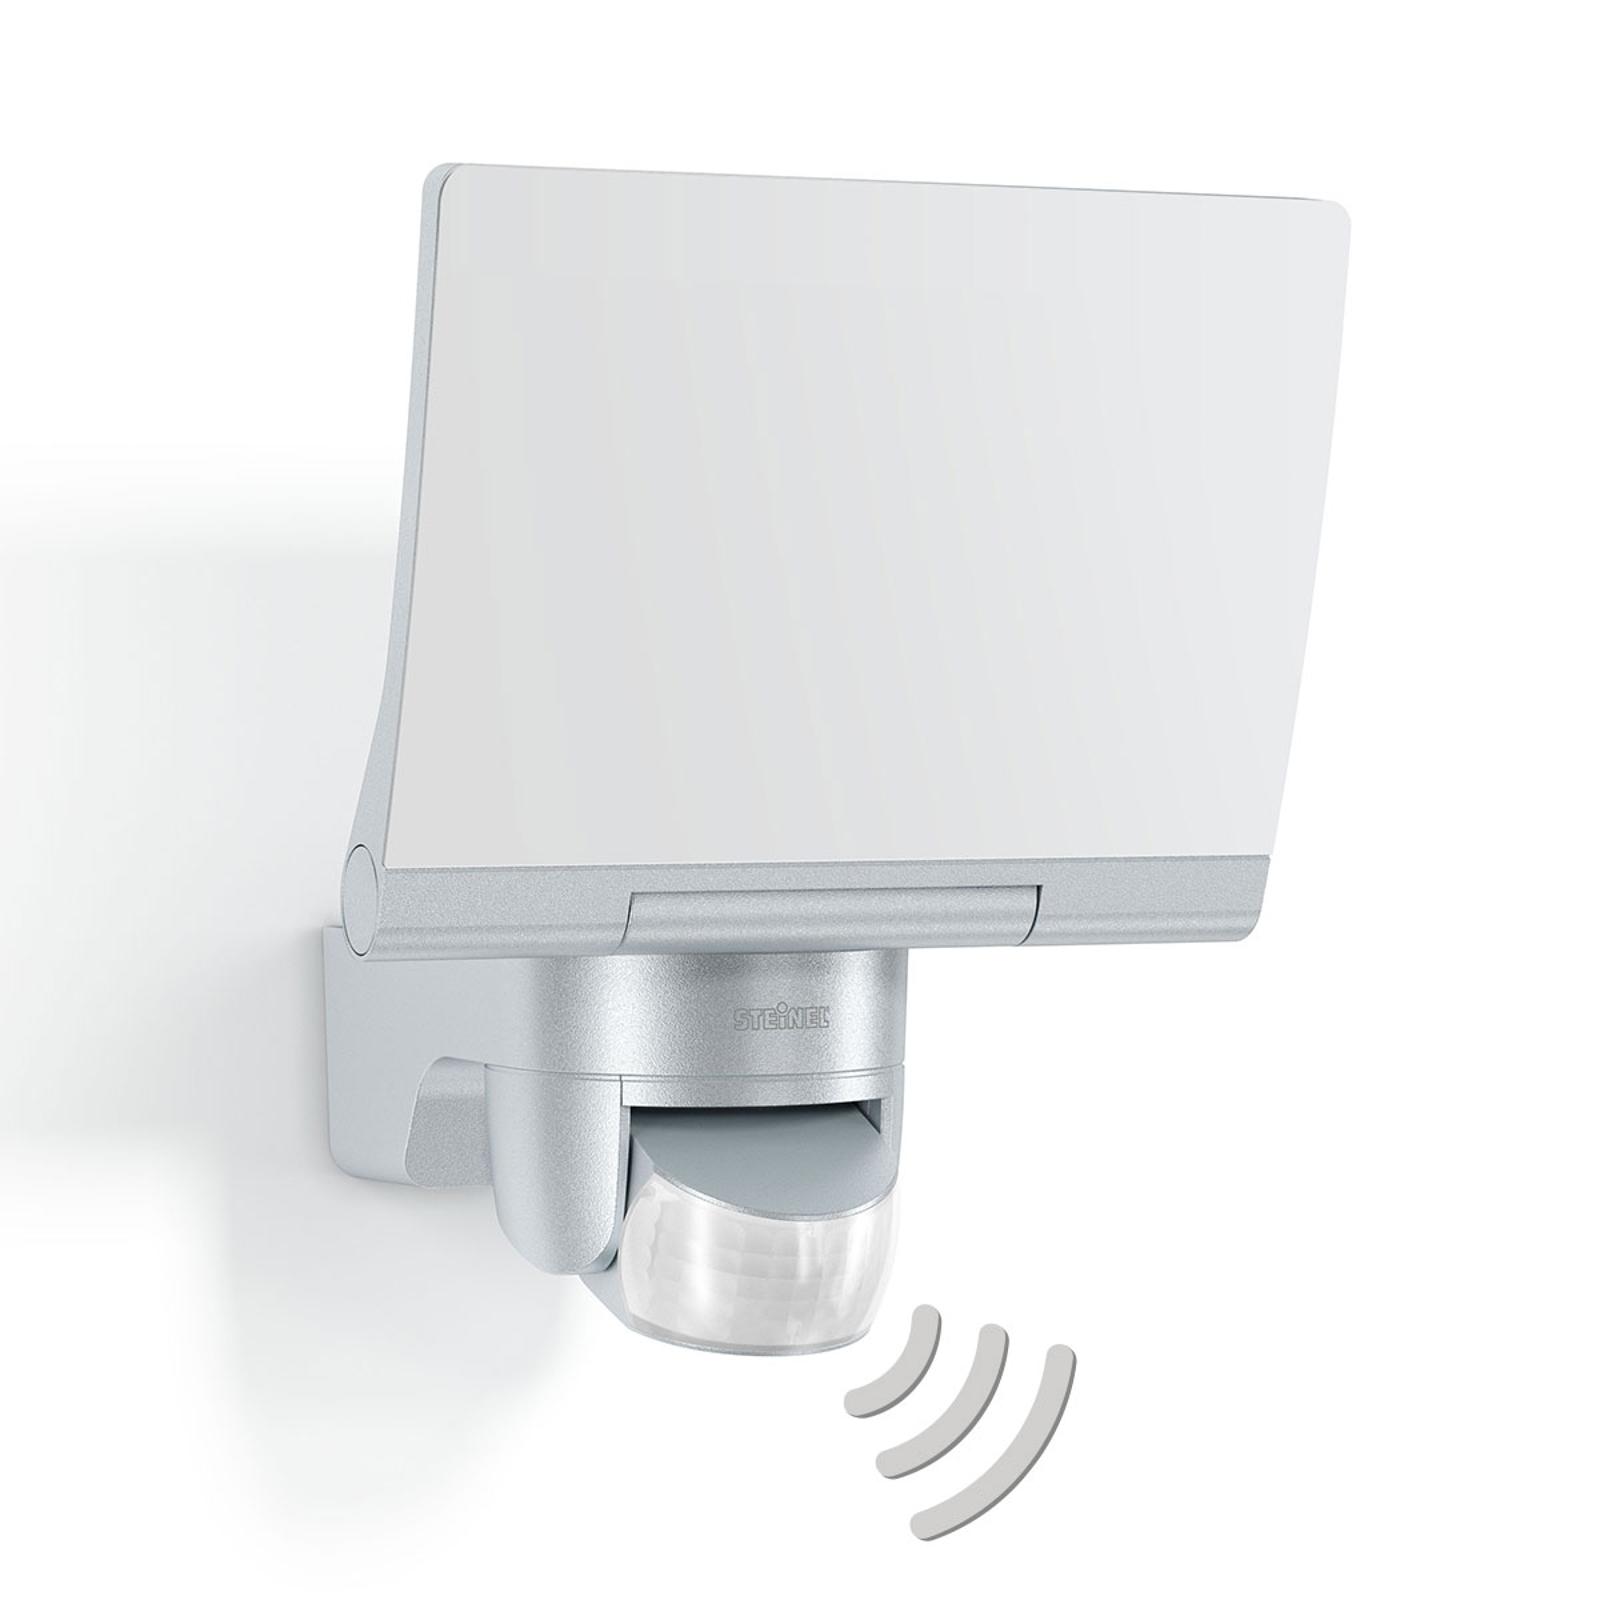 STEINEL XLED Home 2 utomhusspot med sensor, silver